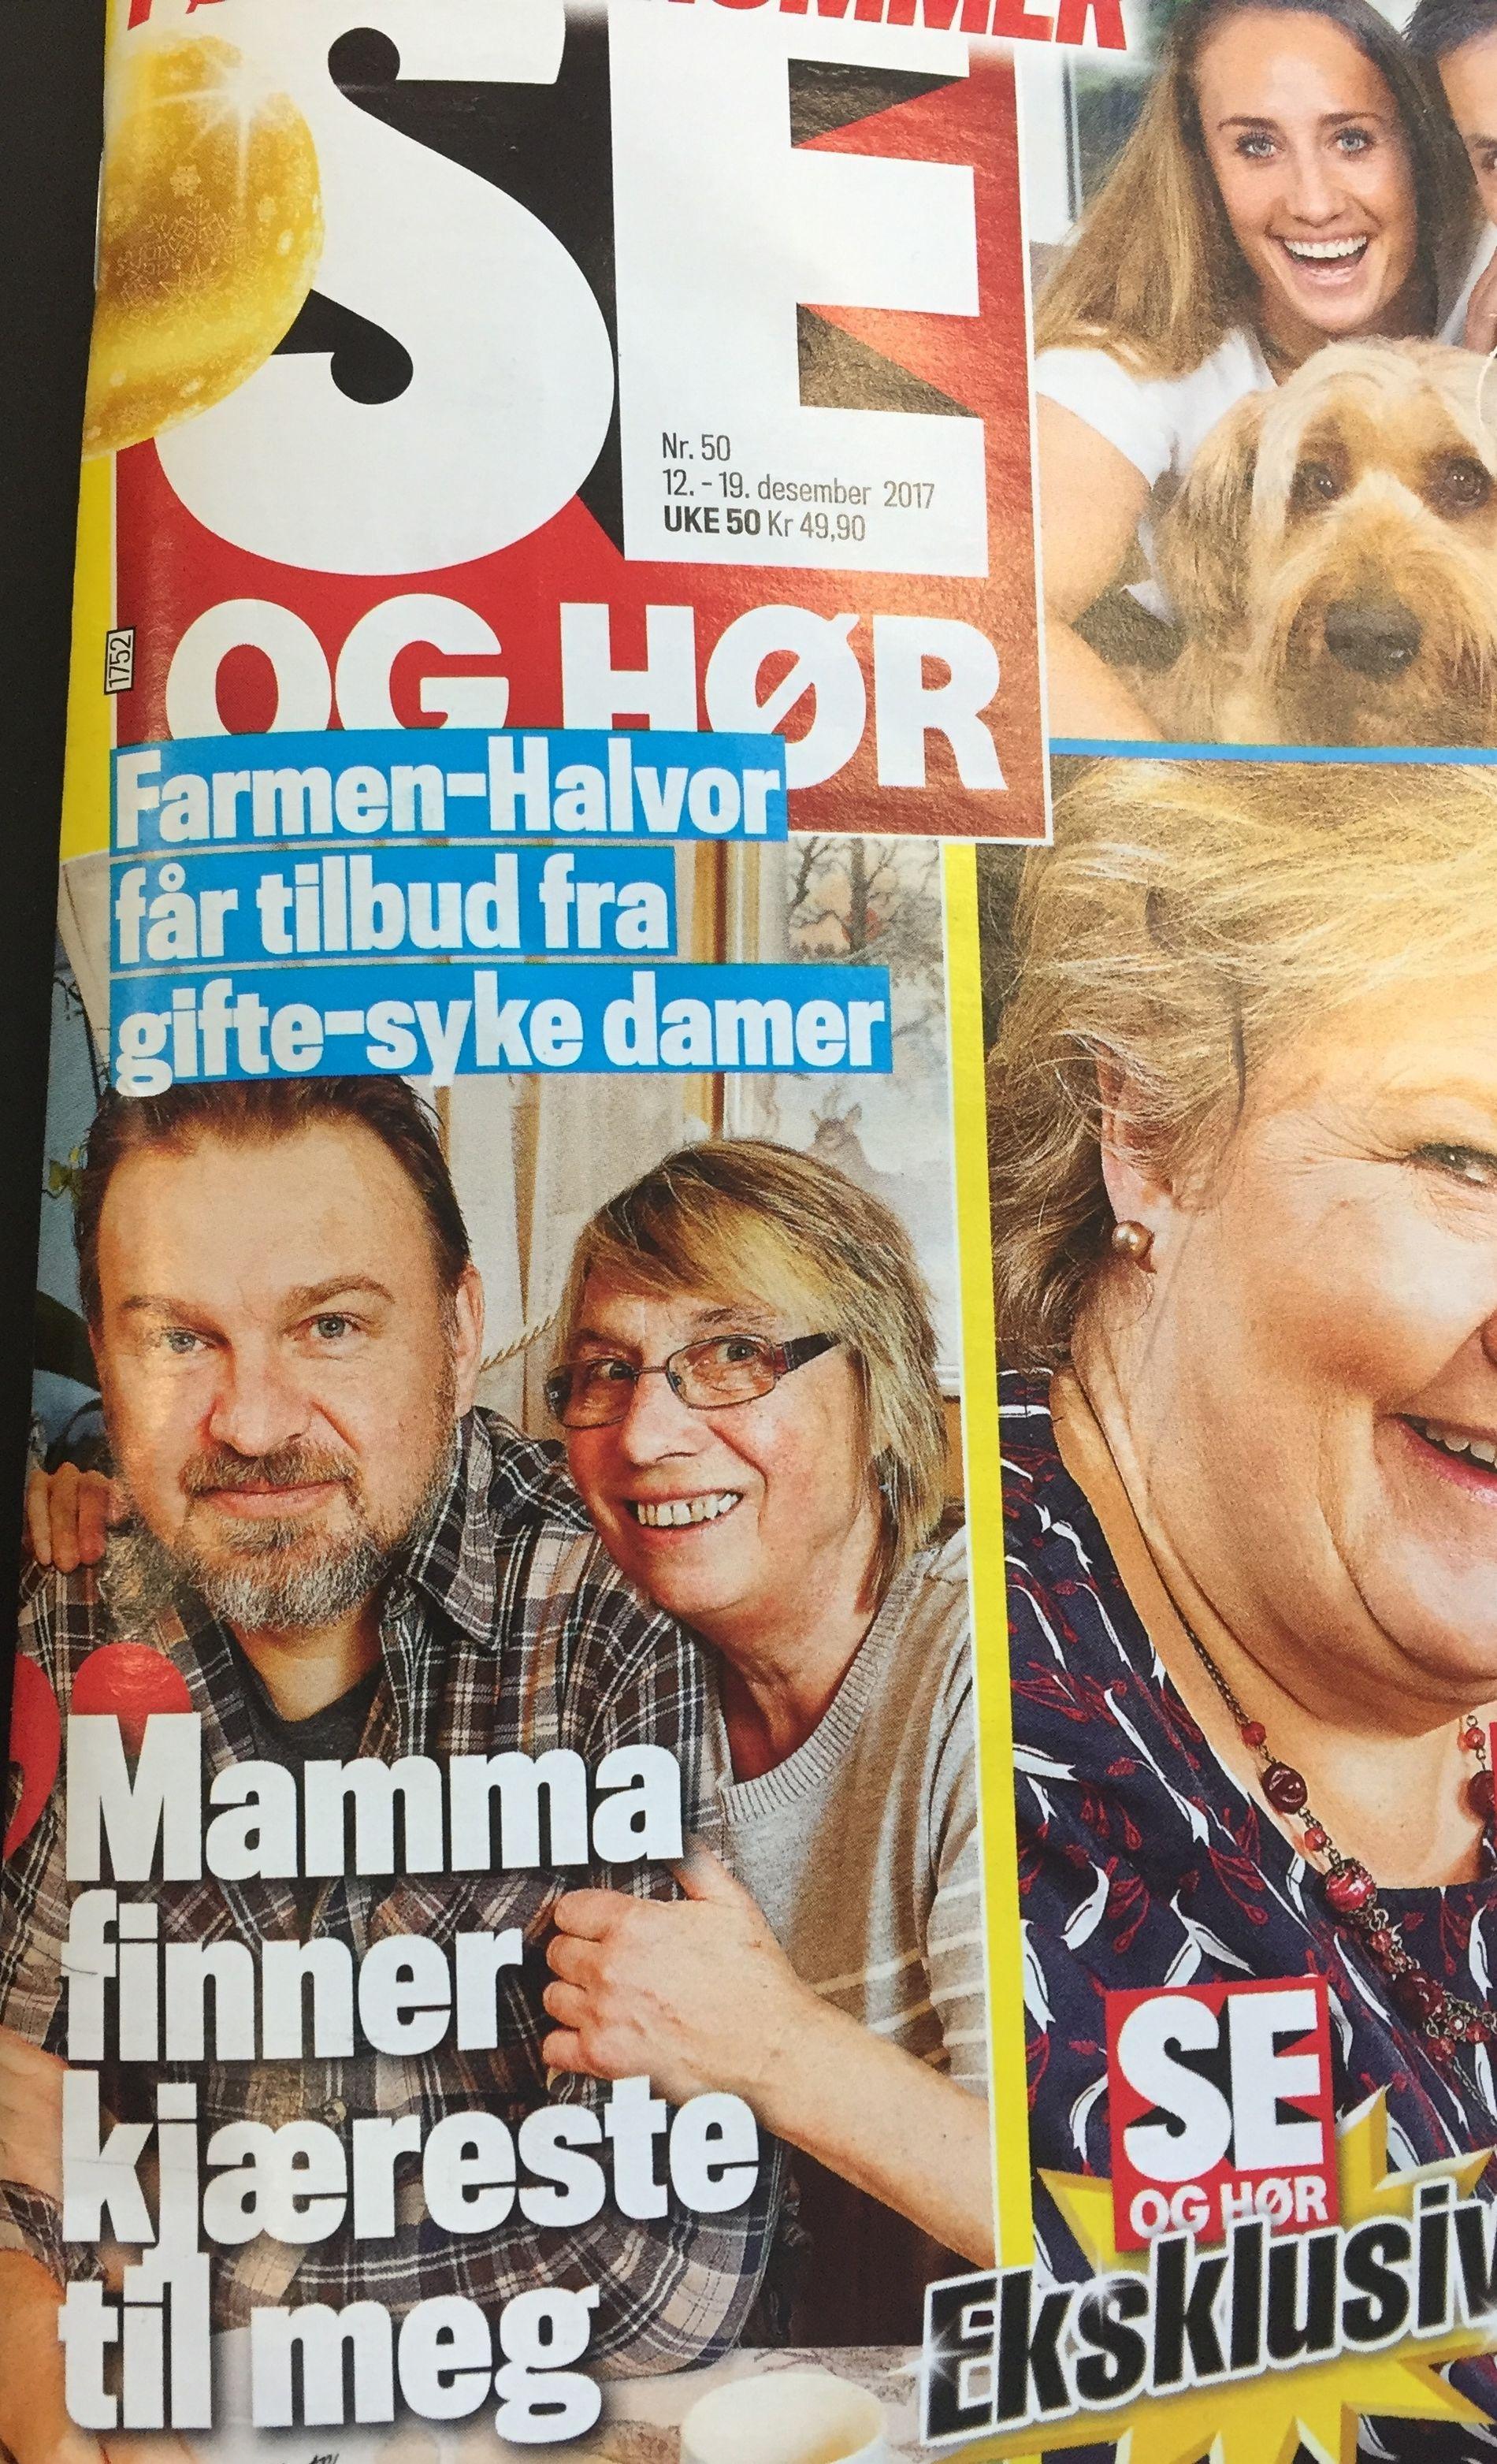 FEILINFORMERER: Dagens Se og Hør-forside. (faksimile)